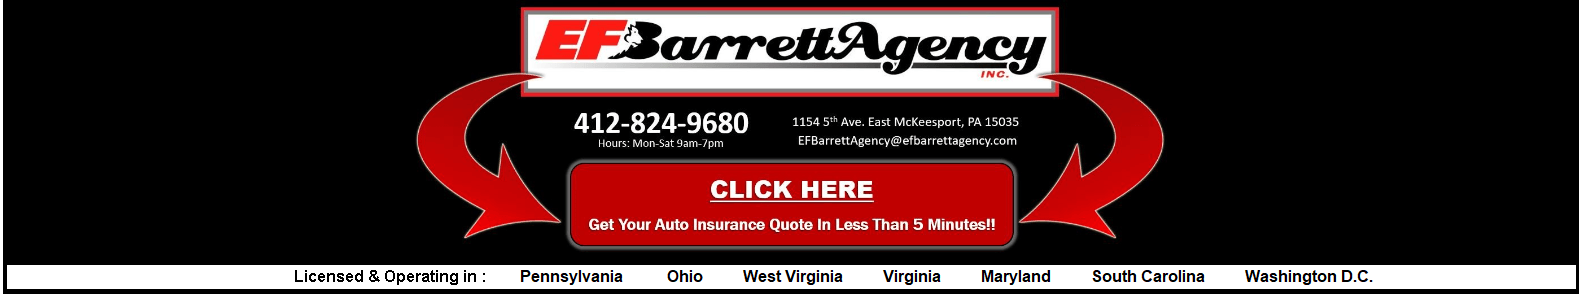 E F Barrett Agency